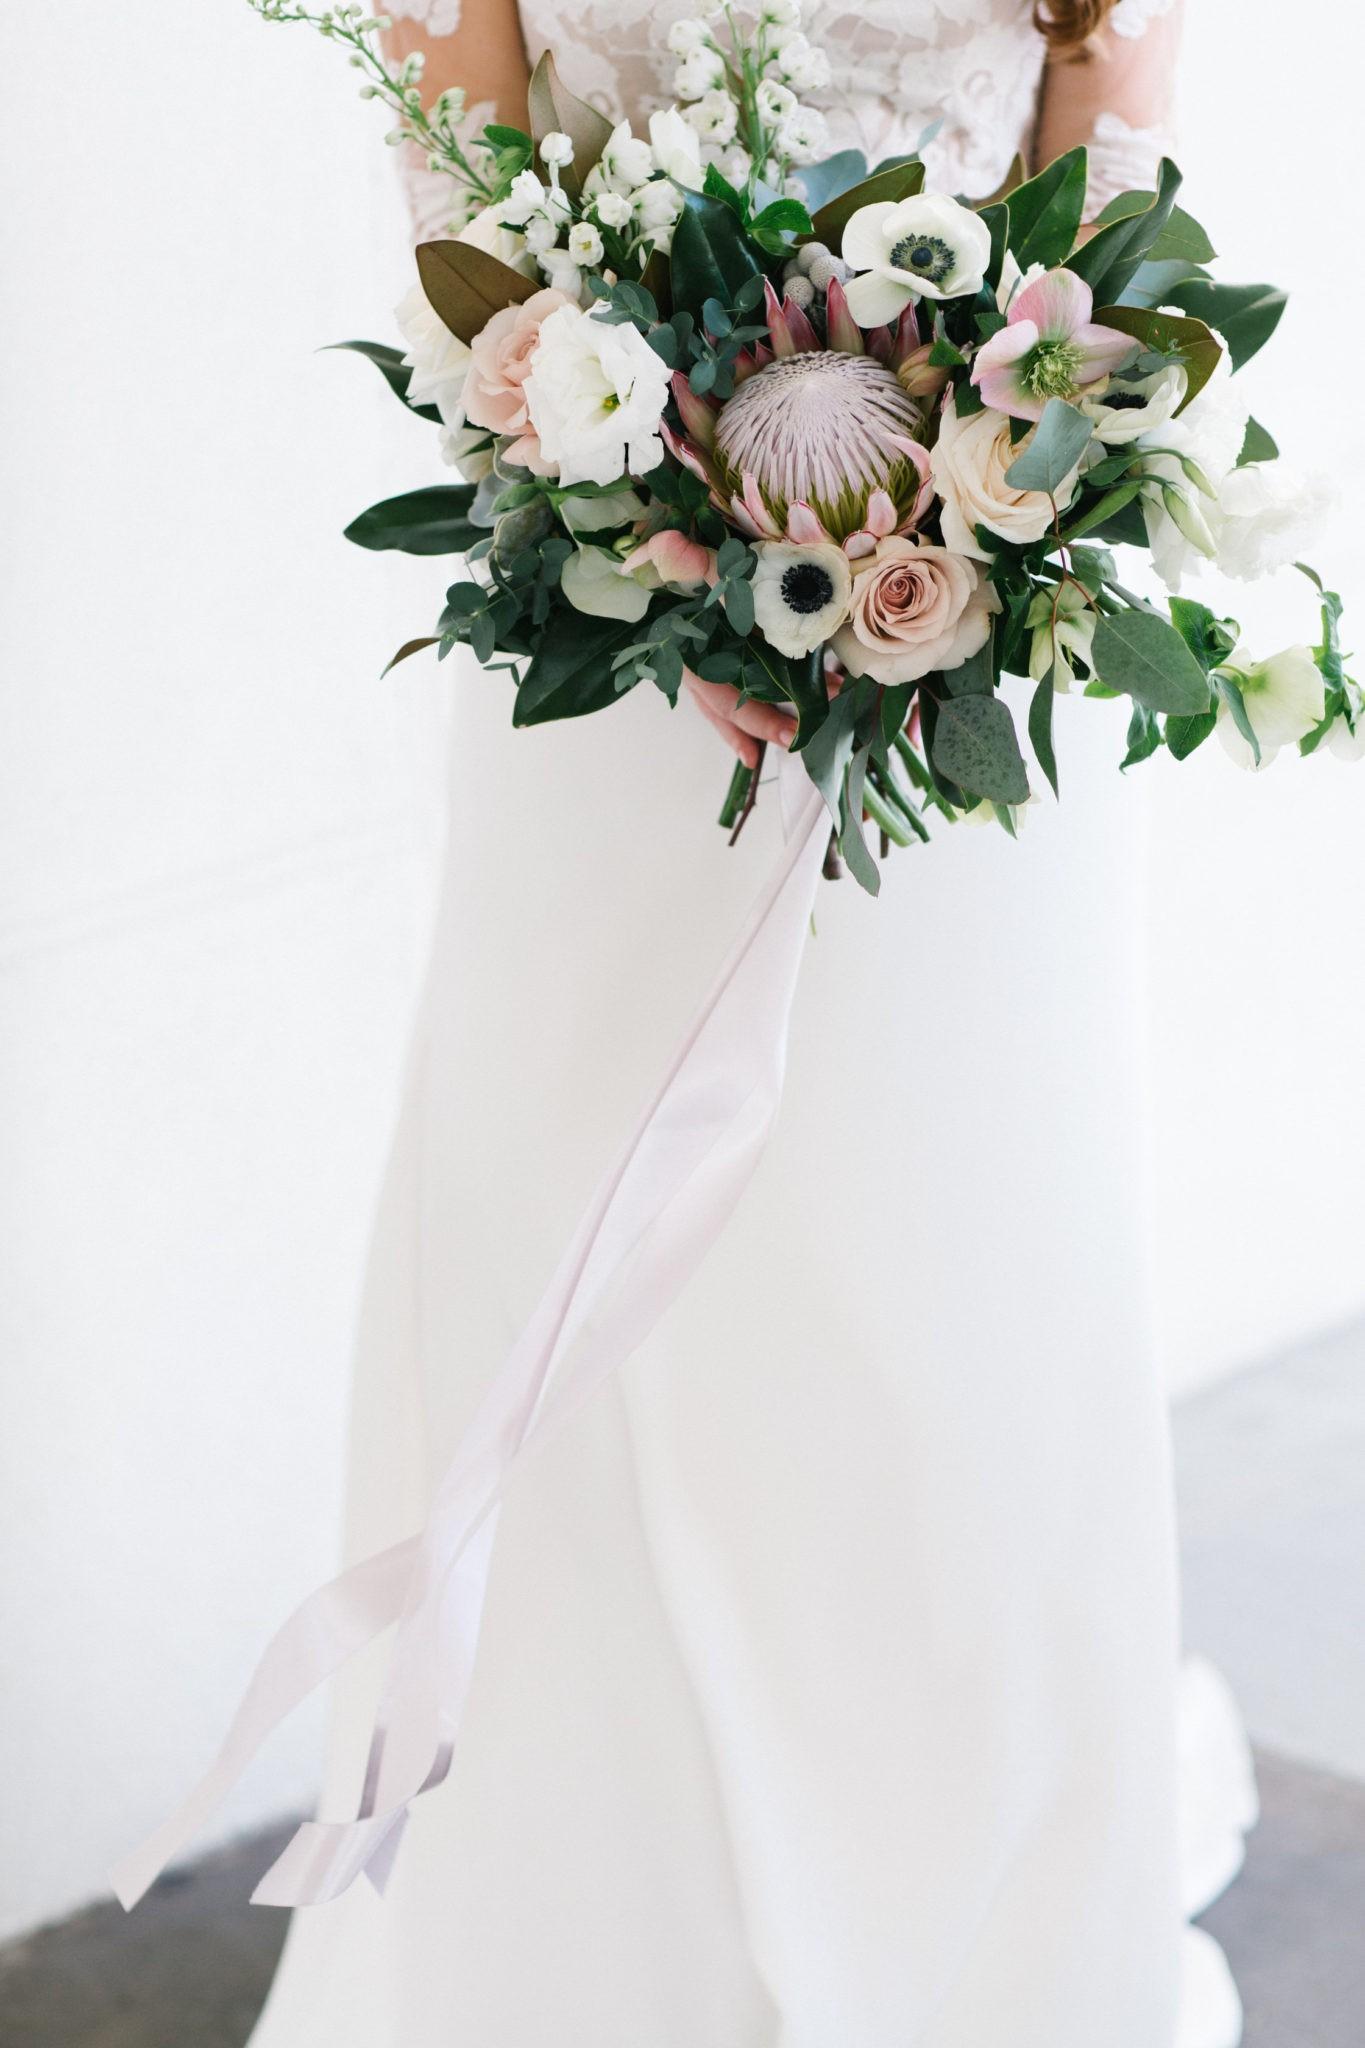 New Orleans wedding flowers